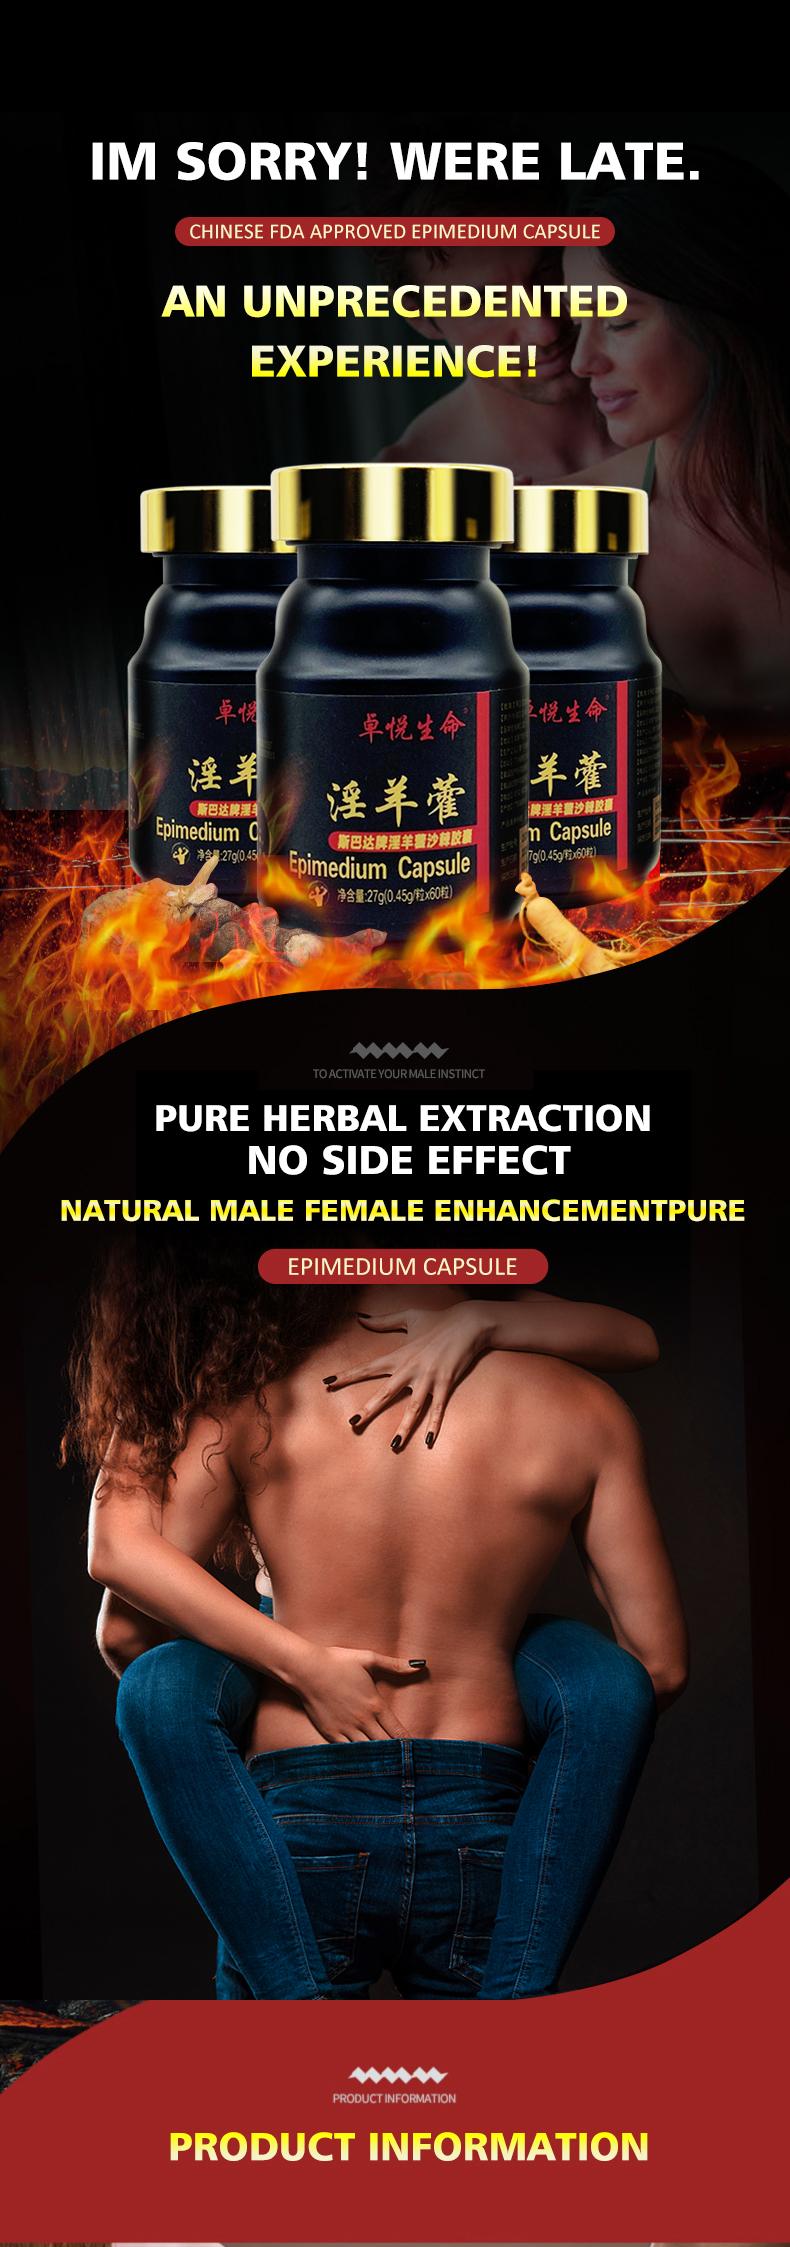 Enhance Performance, Plus Increse Stamina And Desire (1)